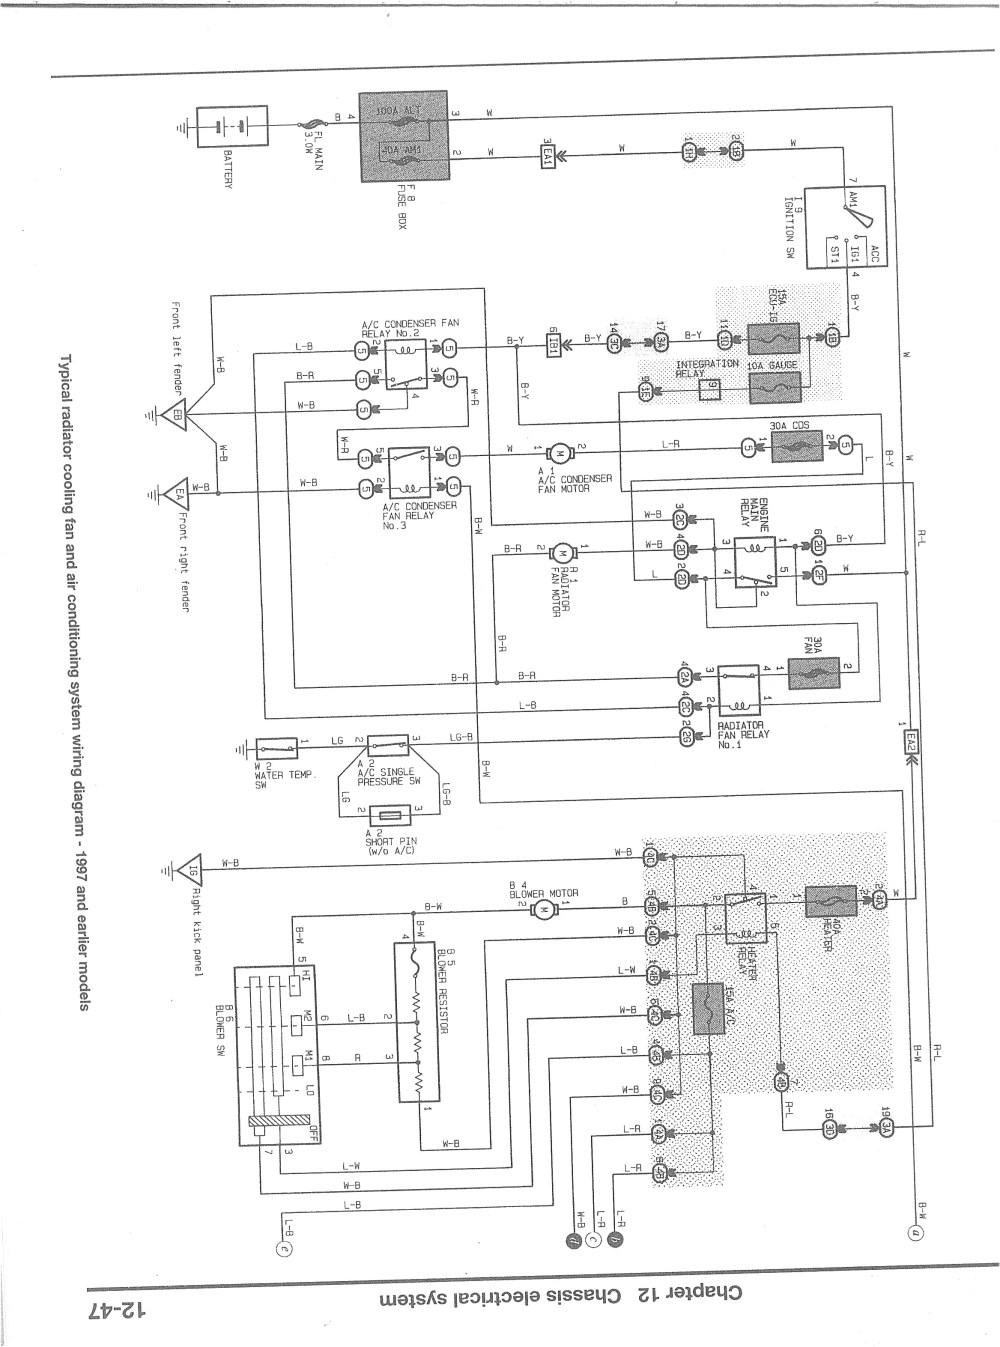 medium resolution of goodman air handler wiring diagram goodman air handler wiring diagram new goodman air handler wiring